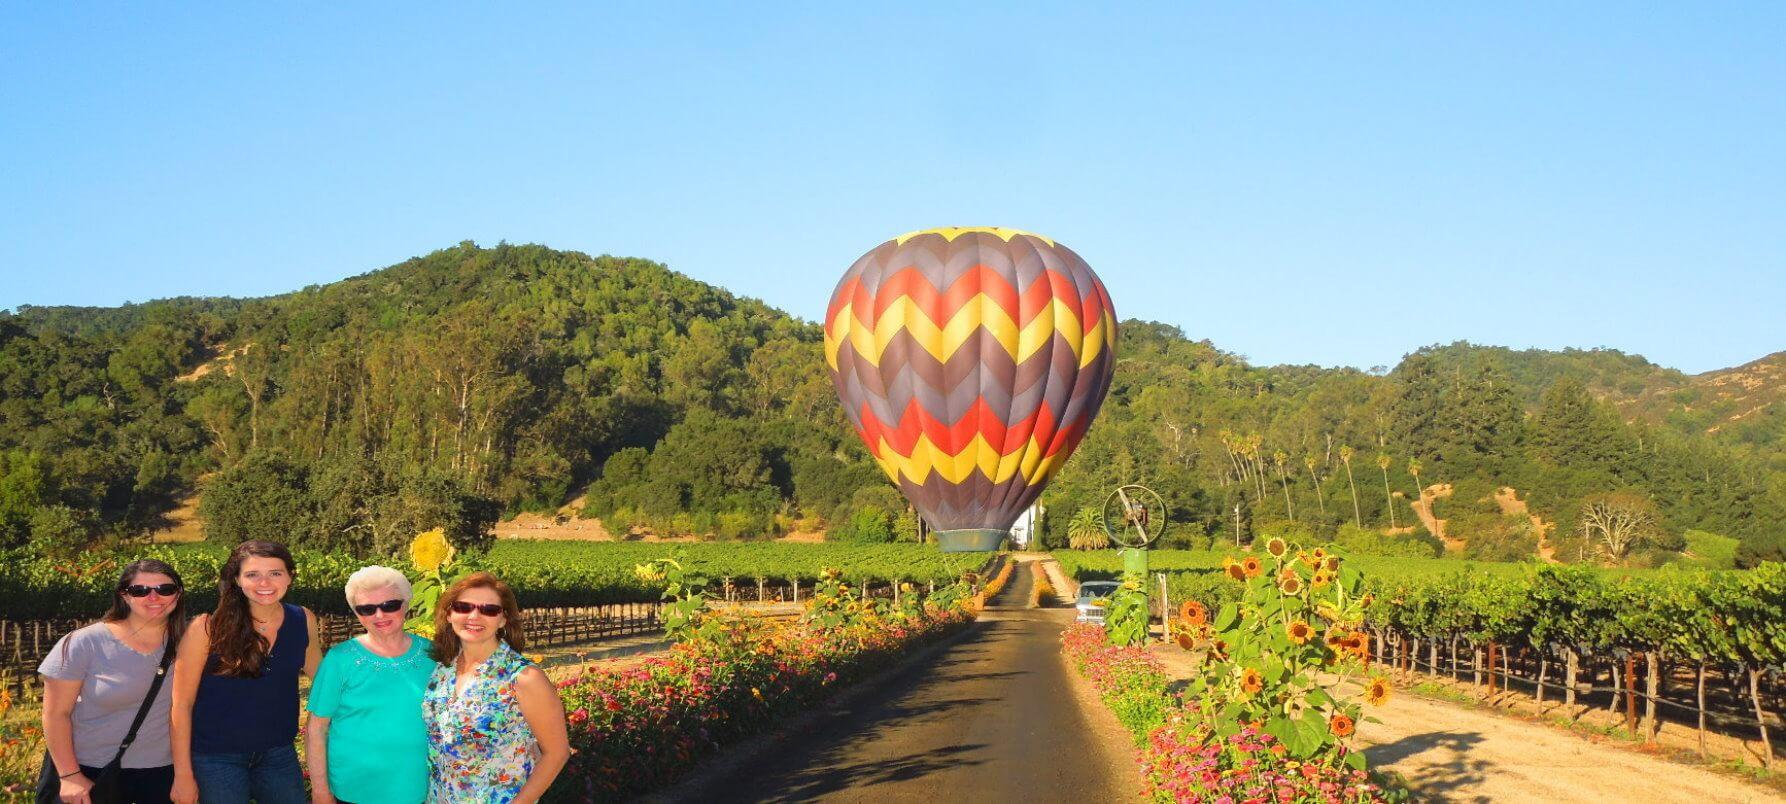 napa-valley-hot-_air-balloon-rides-alcatraz-tours